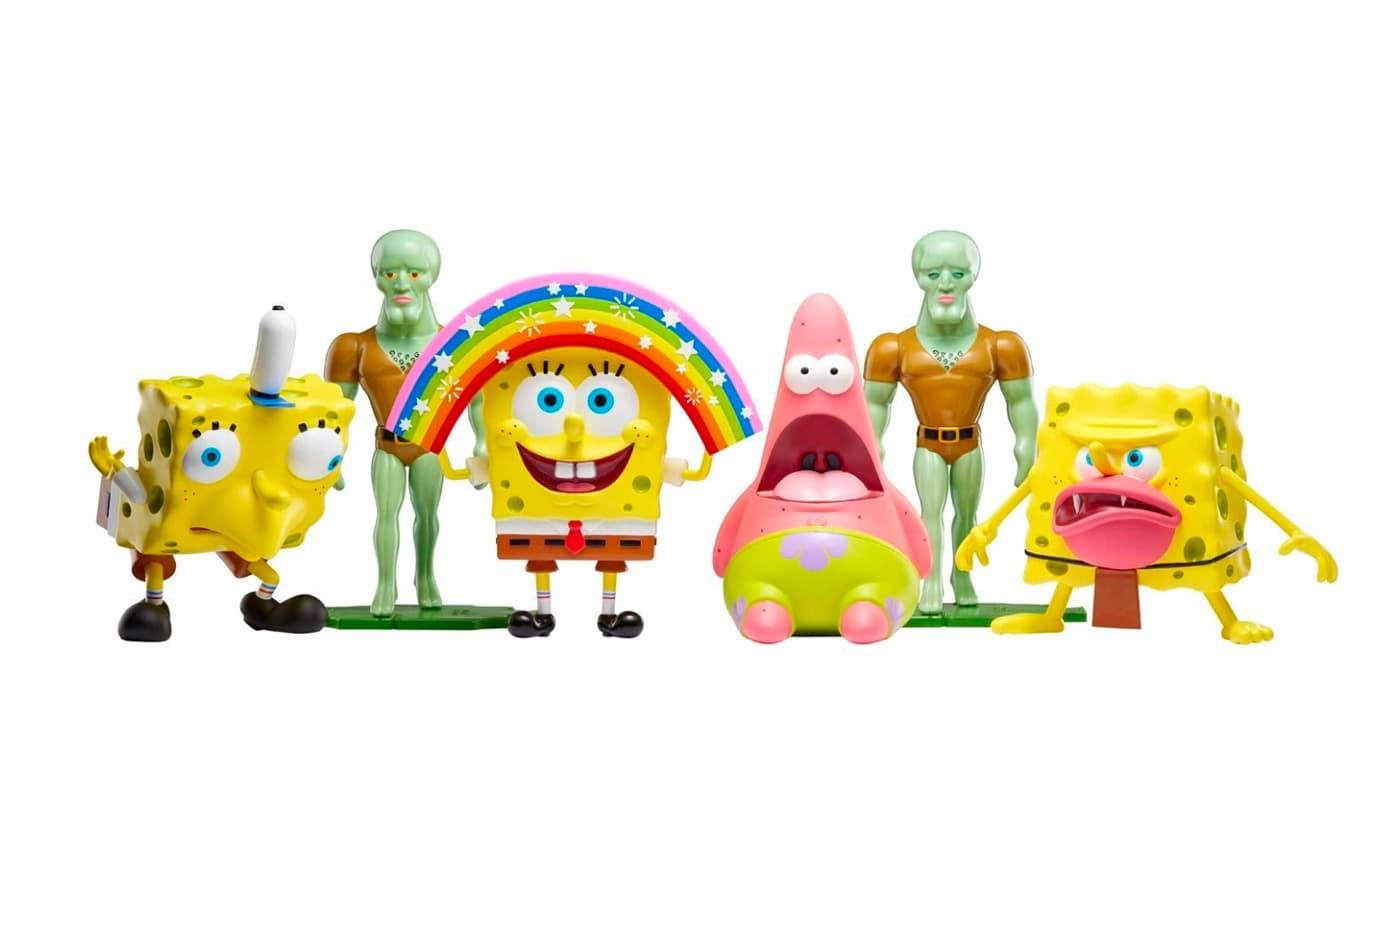 Nickelodeon Celebrates 'Spongebob Squarepants' Memes With Collectible Figures